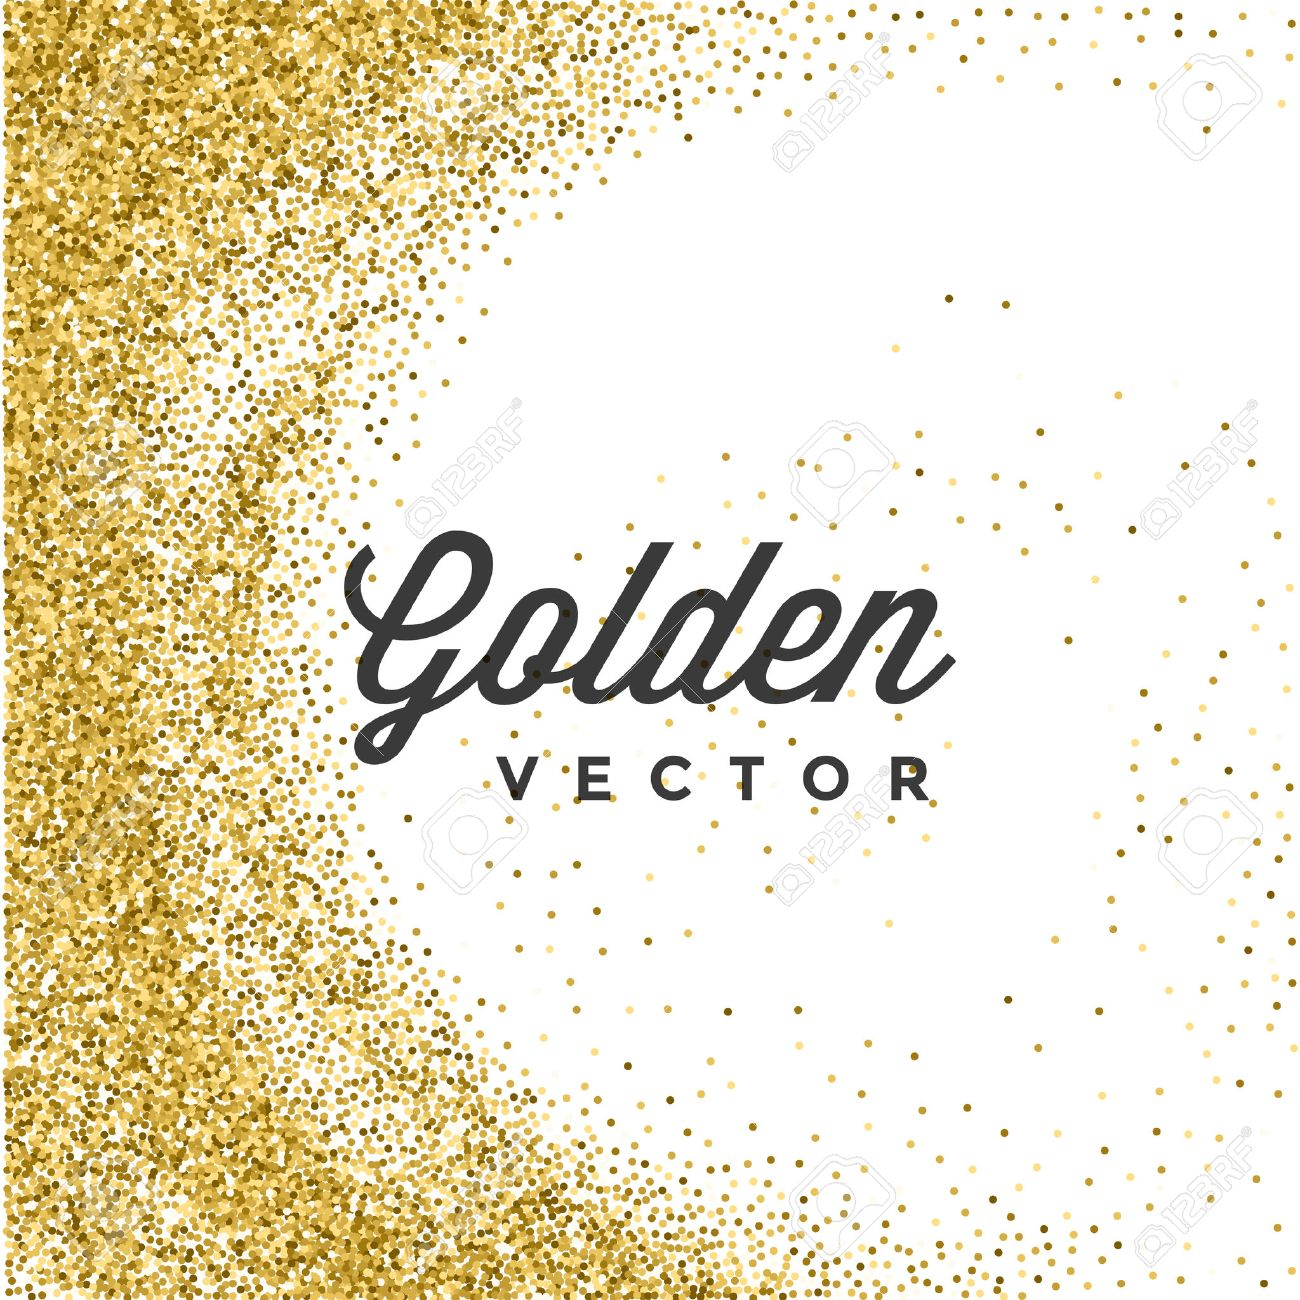 Confetti background vector golden confetti background - Gold Glitter Sparkles Bright Confetti White Vector Background Good For Greeting Gold Cards Luxury